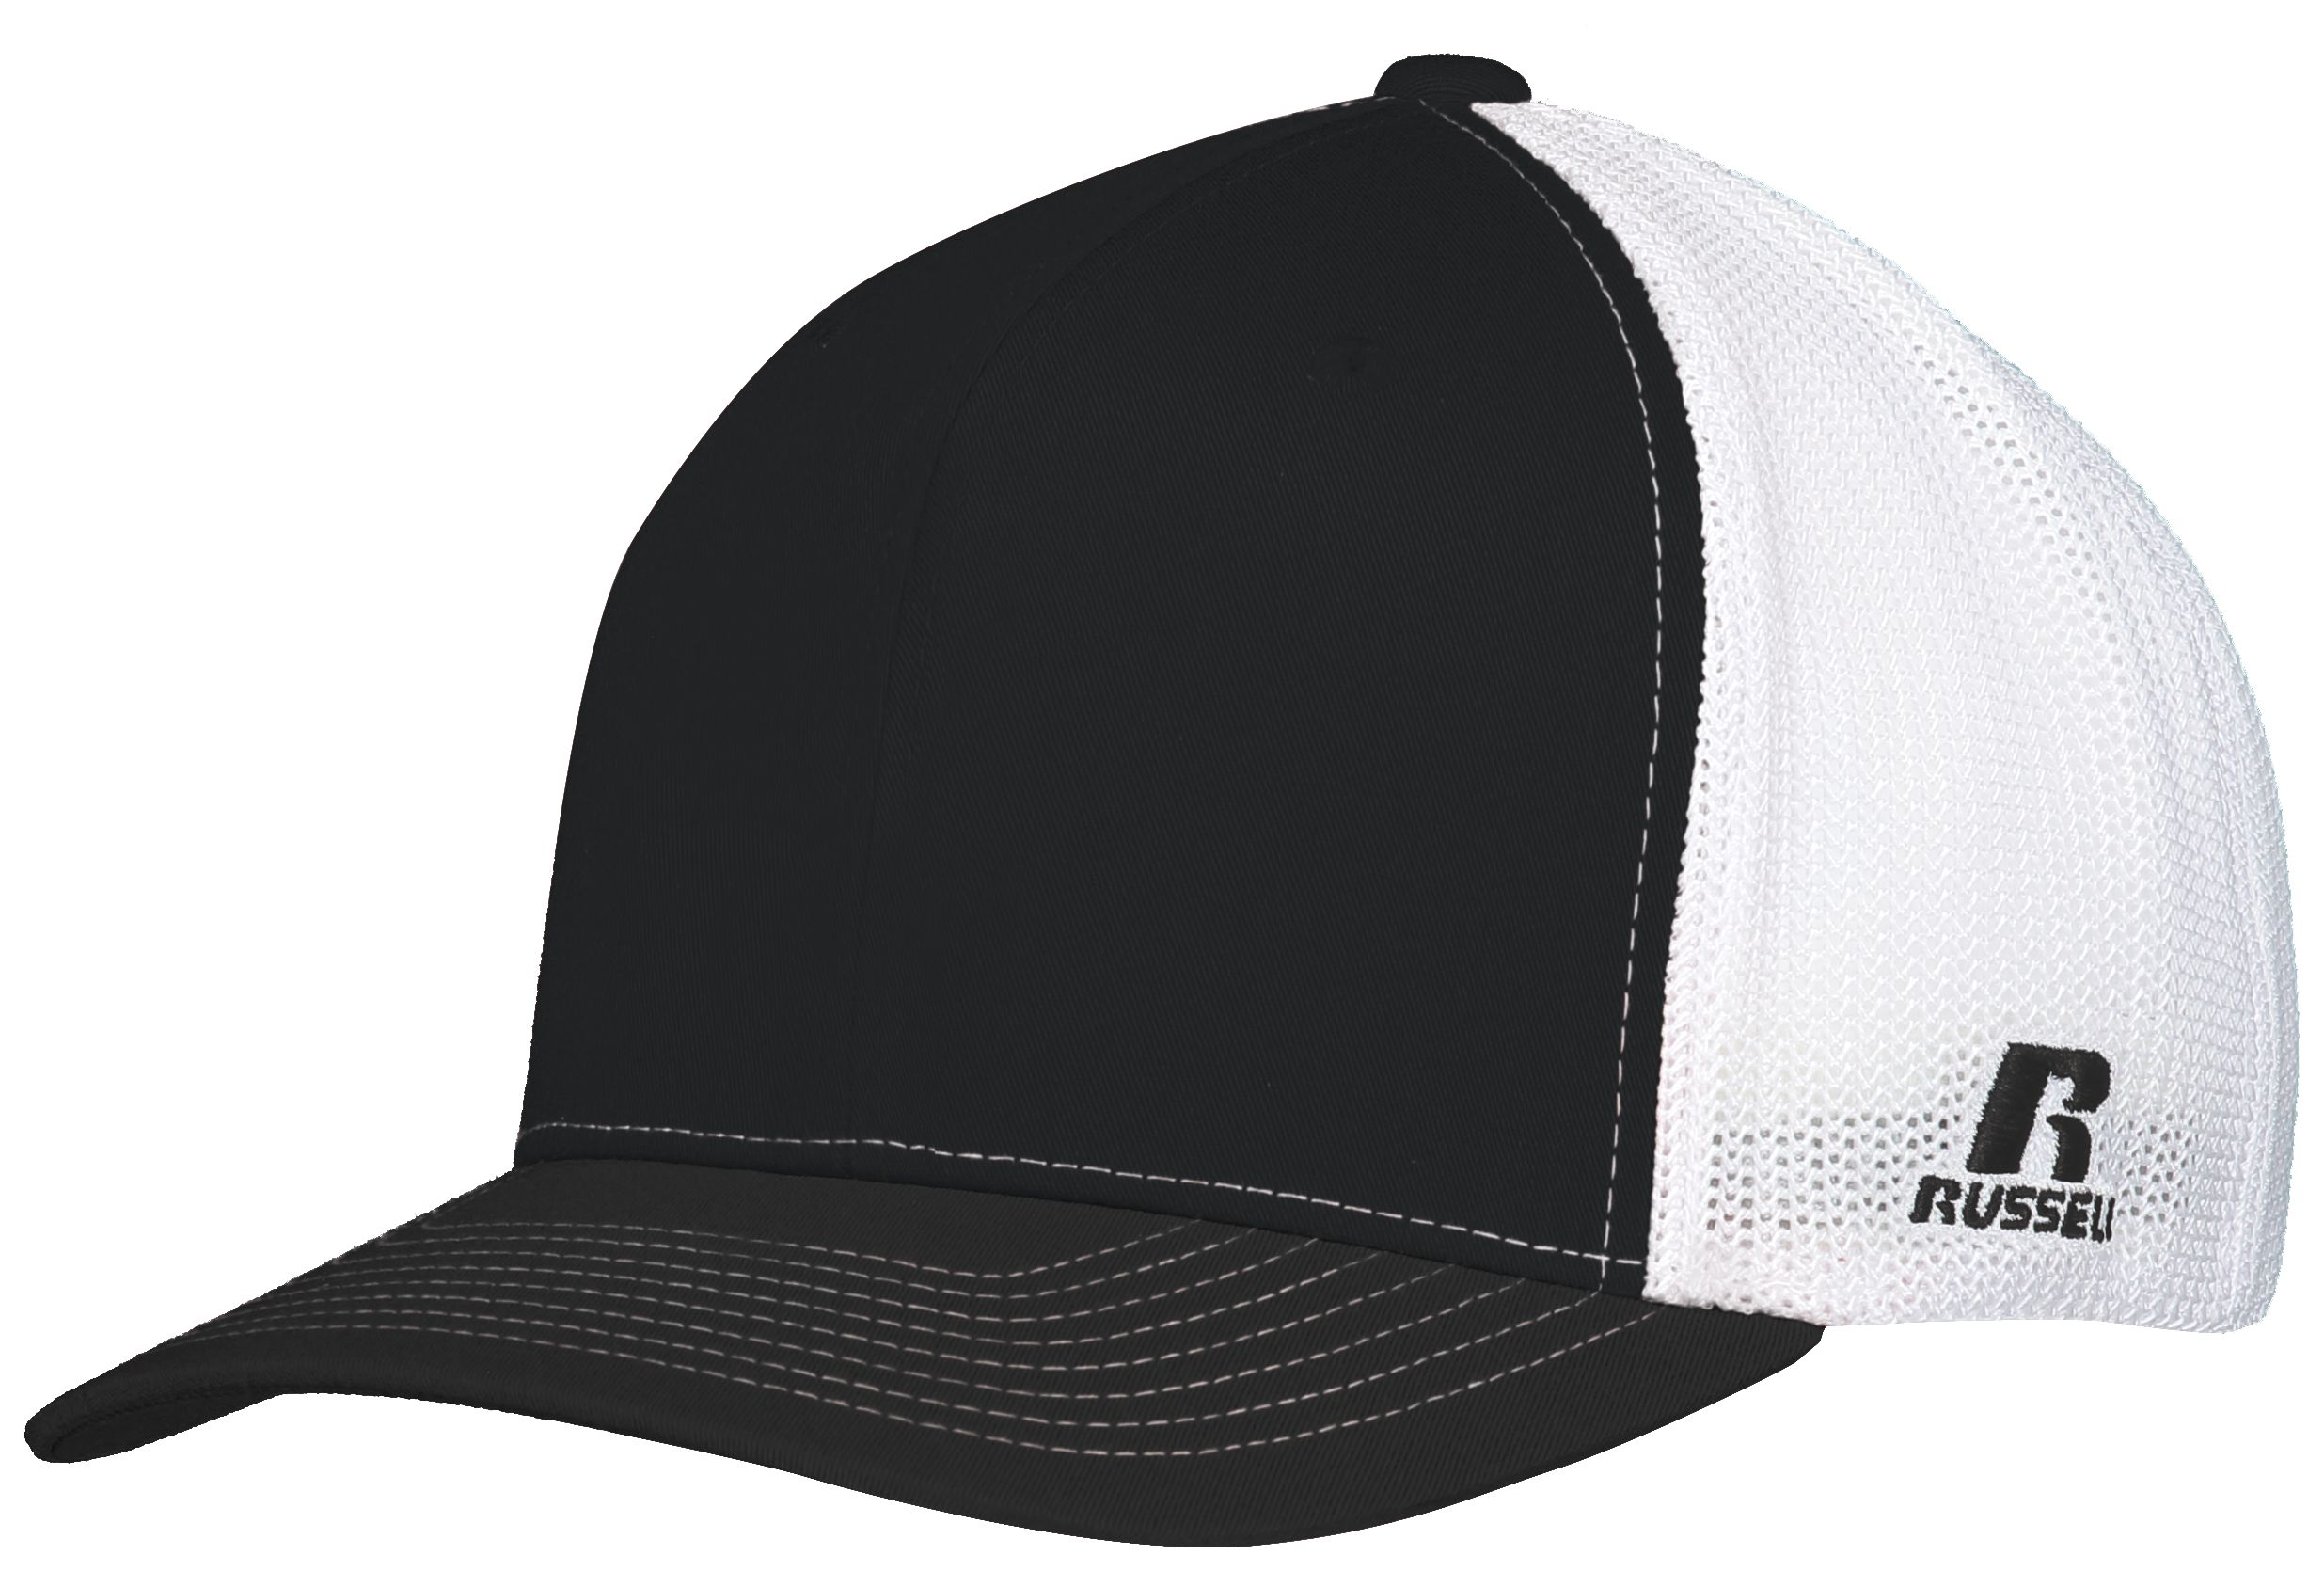 Youth Flexfit Twill Mesh Cap - BLACK/WHITE